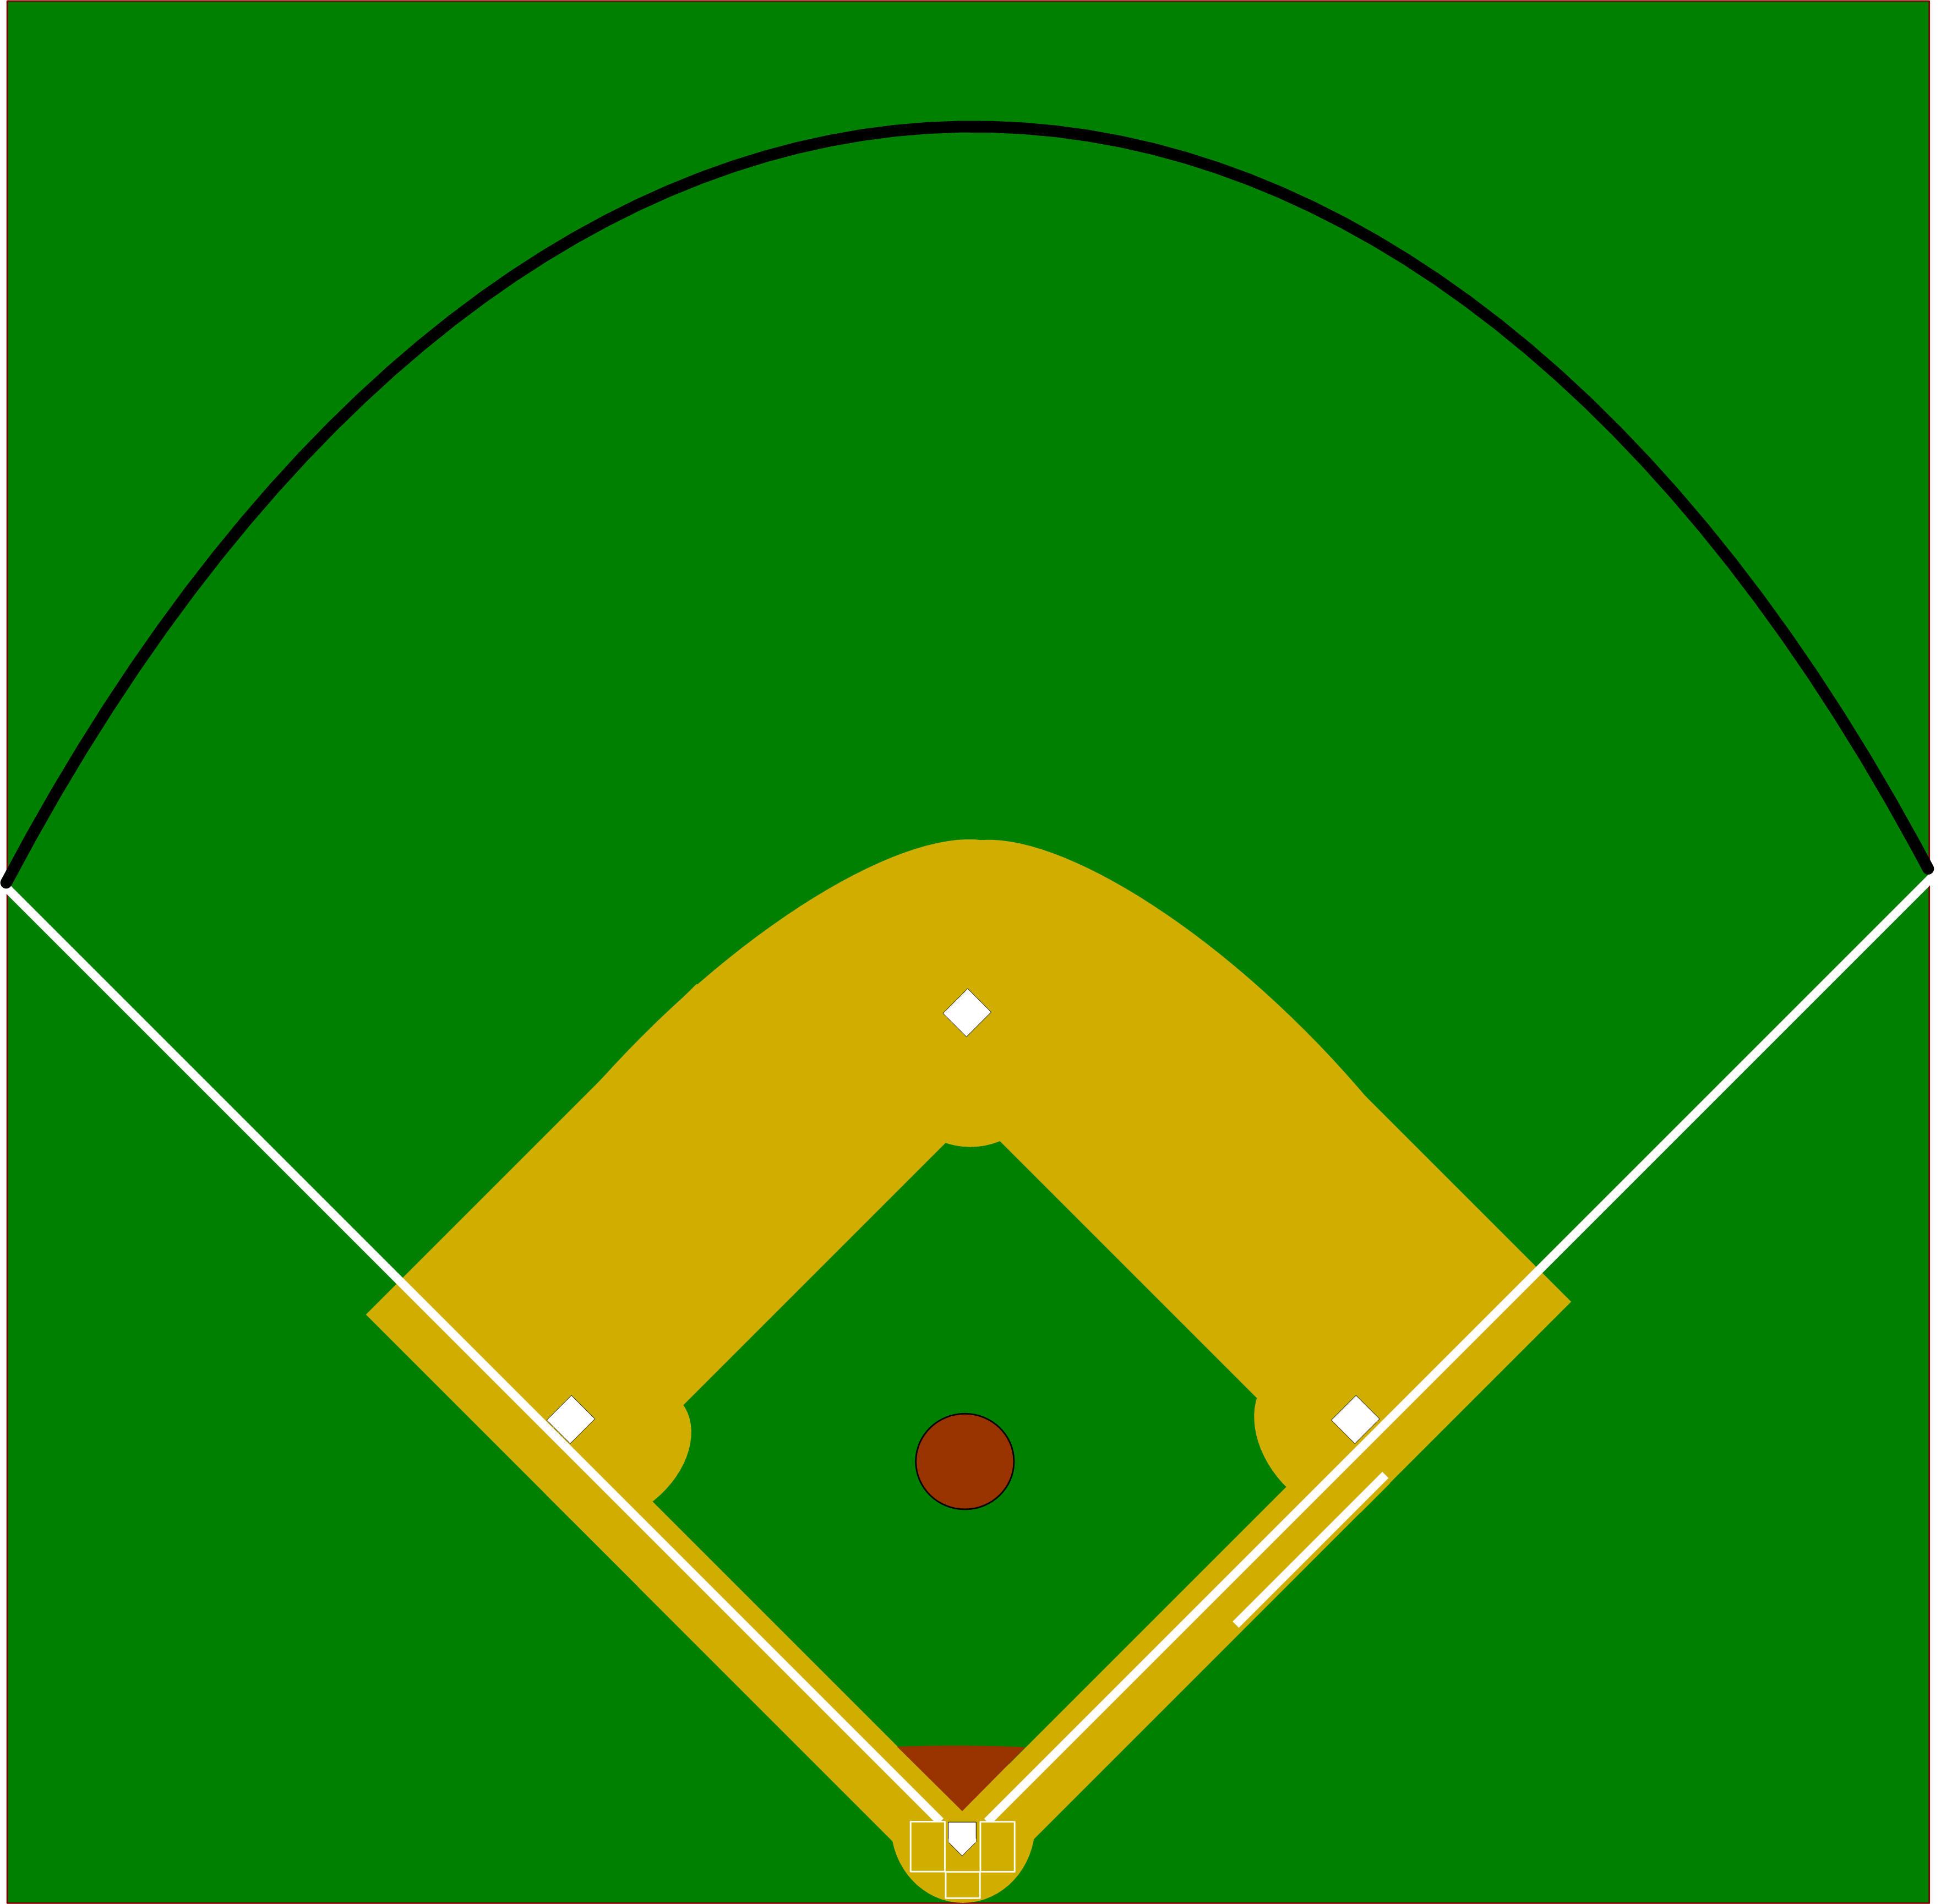 Vector Baseball Diamond Clipart Best-Vector Baseball Diamond Clipart Best-18